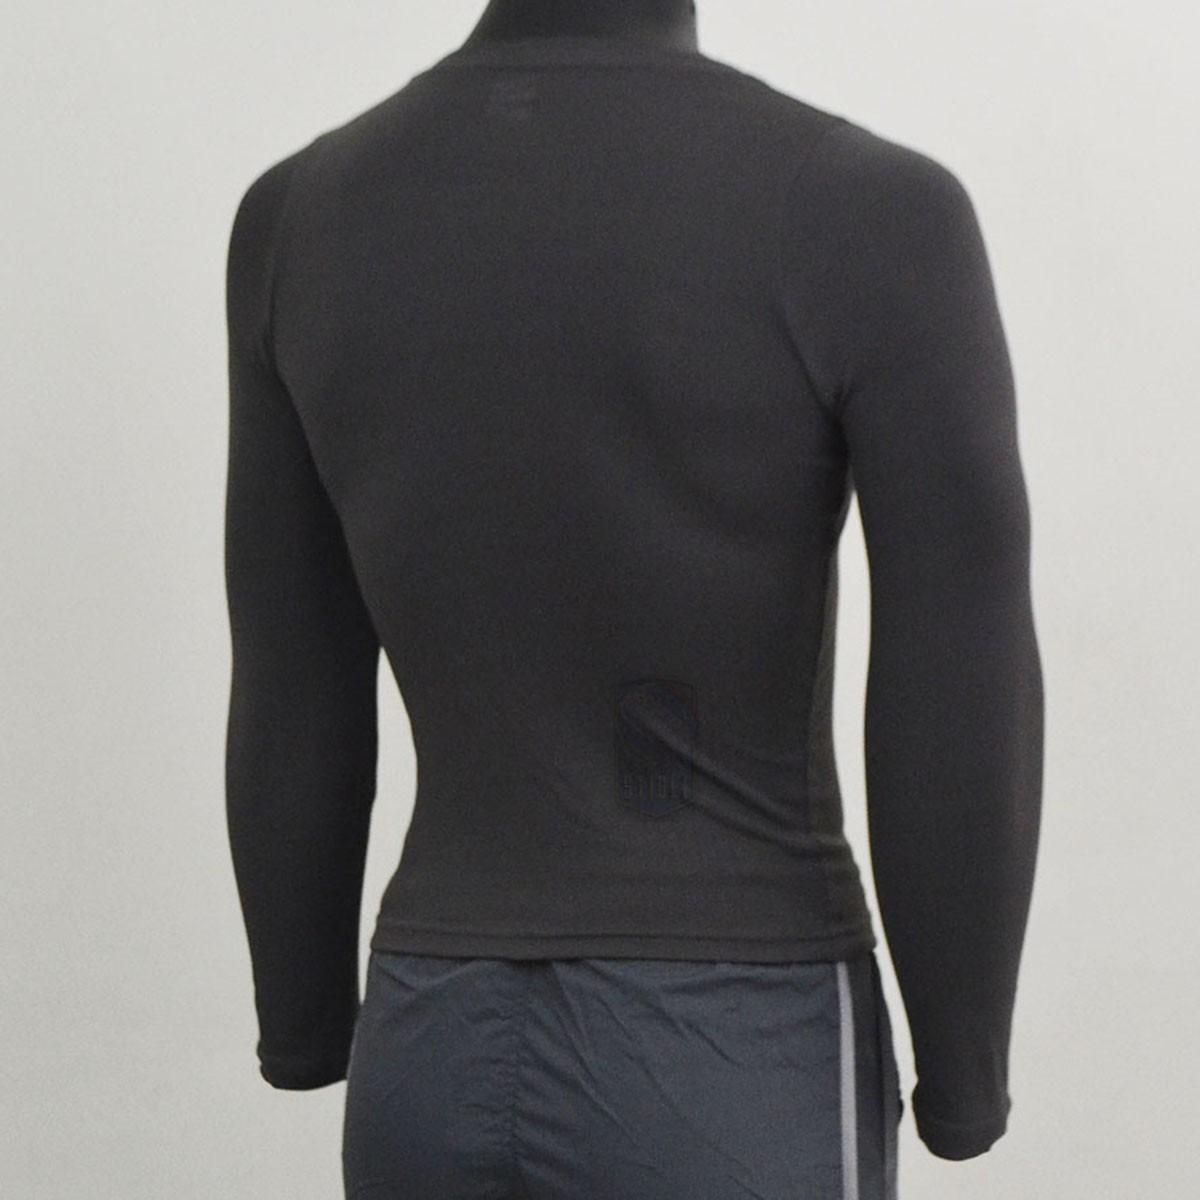 eecfdc6c19 camisa térmica segunda pele kanxa manga longa poliamida c nf. Carregando  zoom.